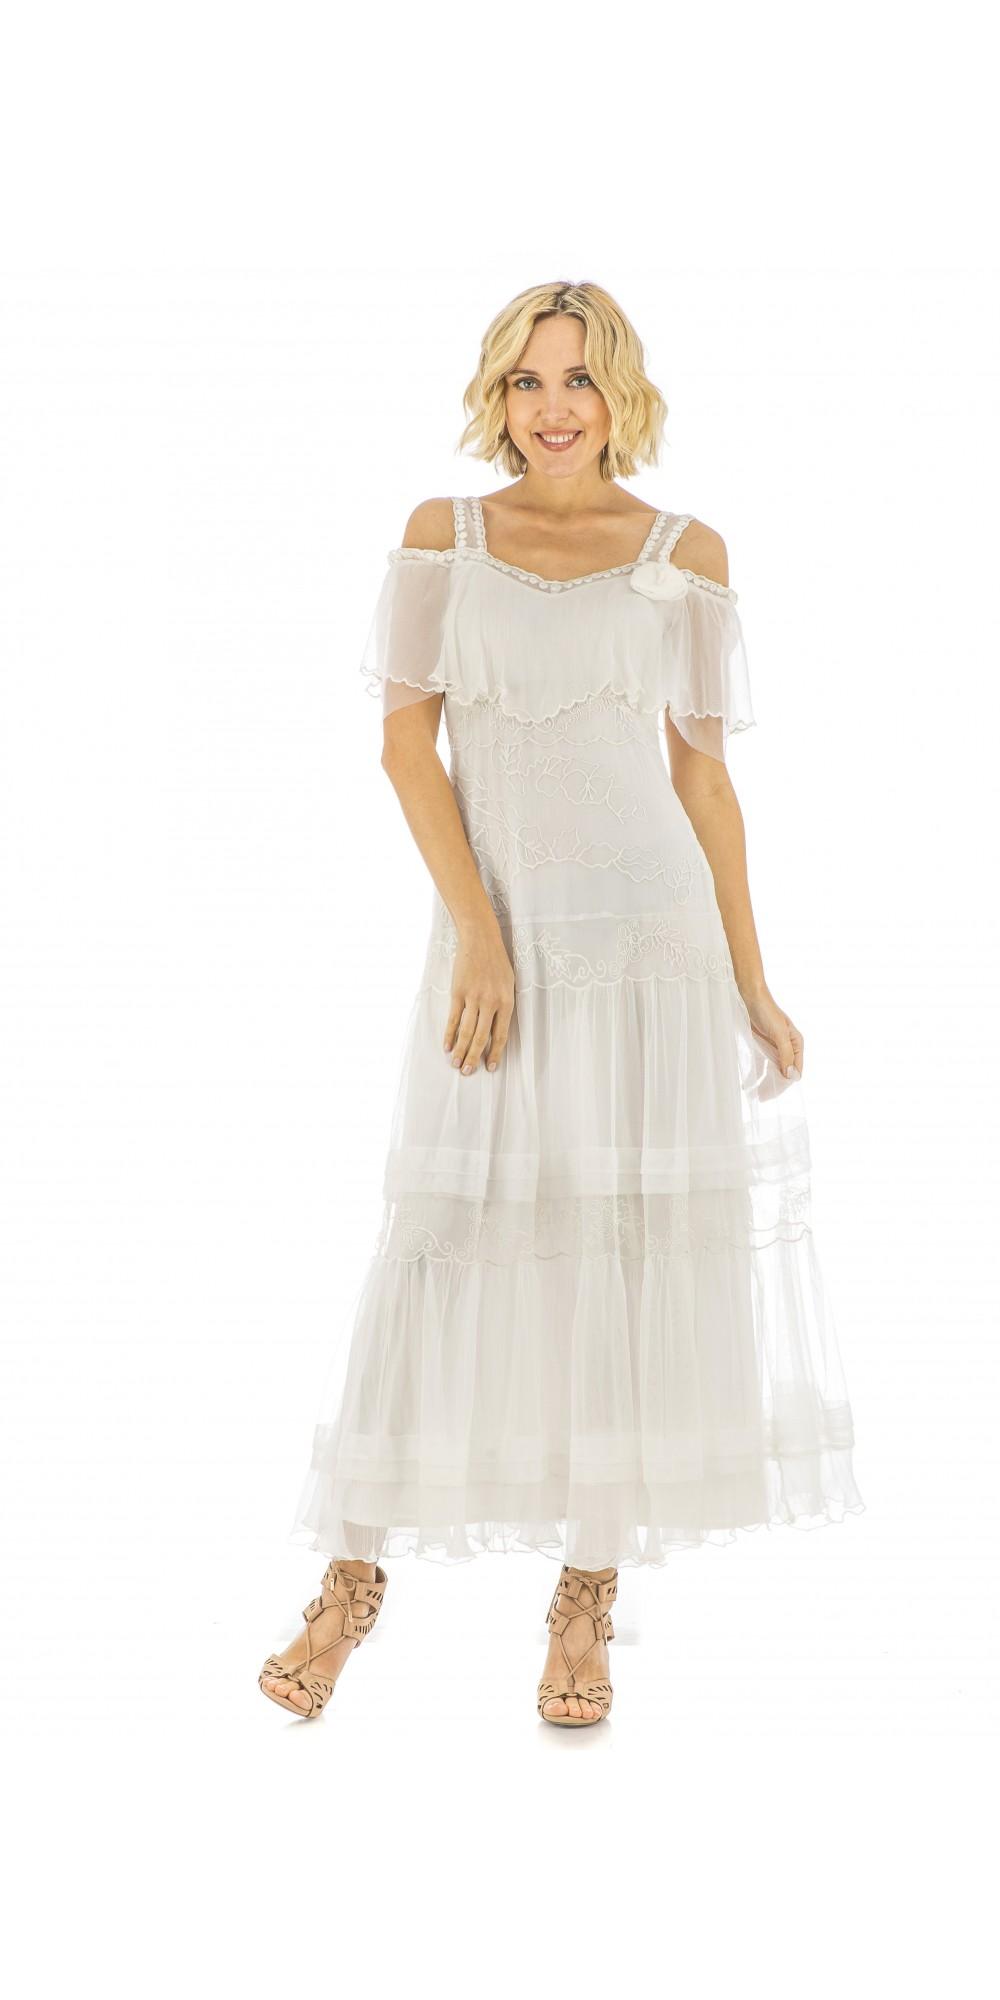 40271 delillah vintage inspired wedding dress in ivory by for Vintage ivory wedding dresses